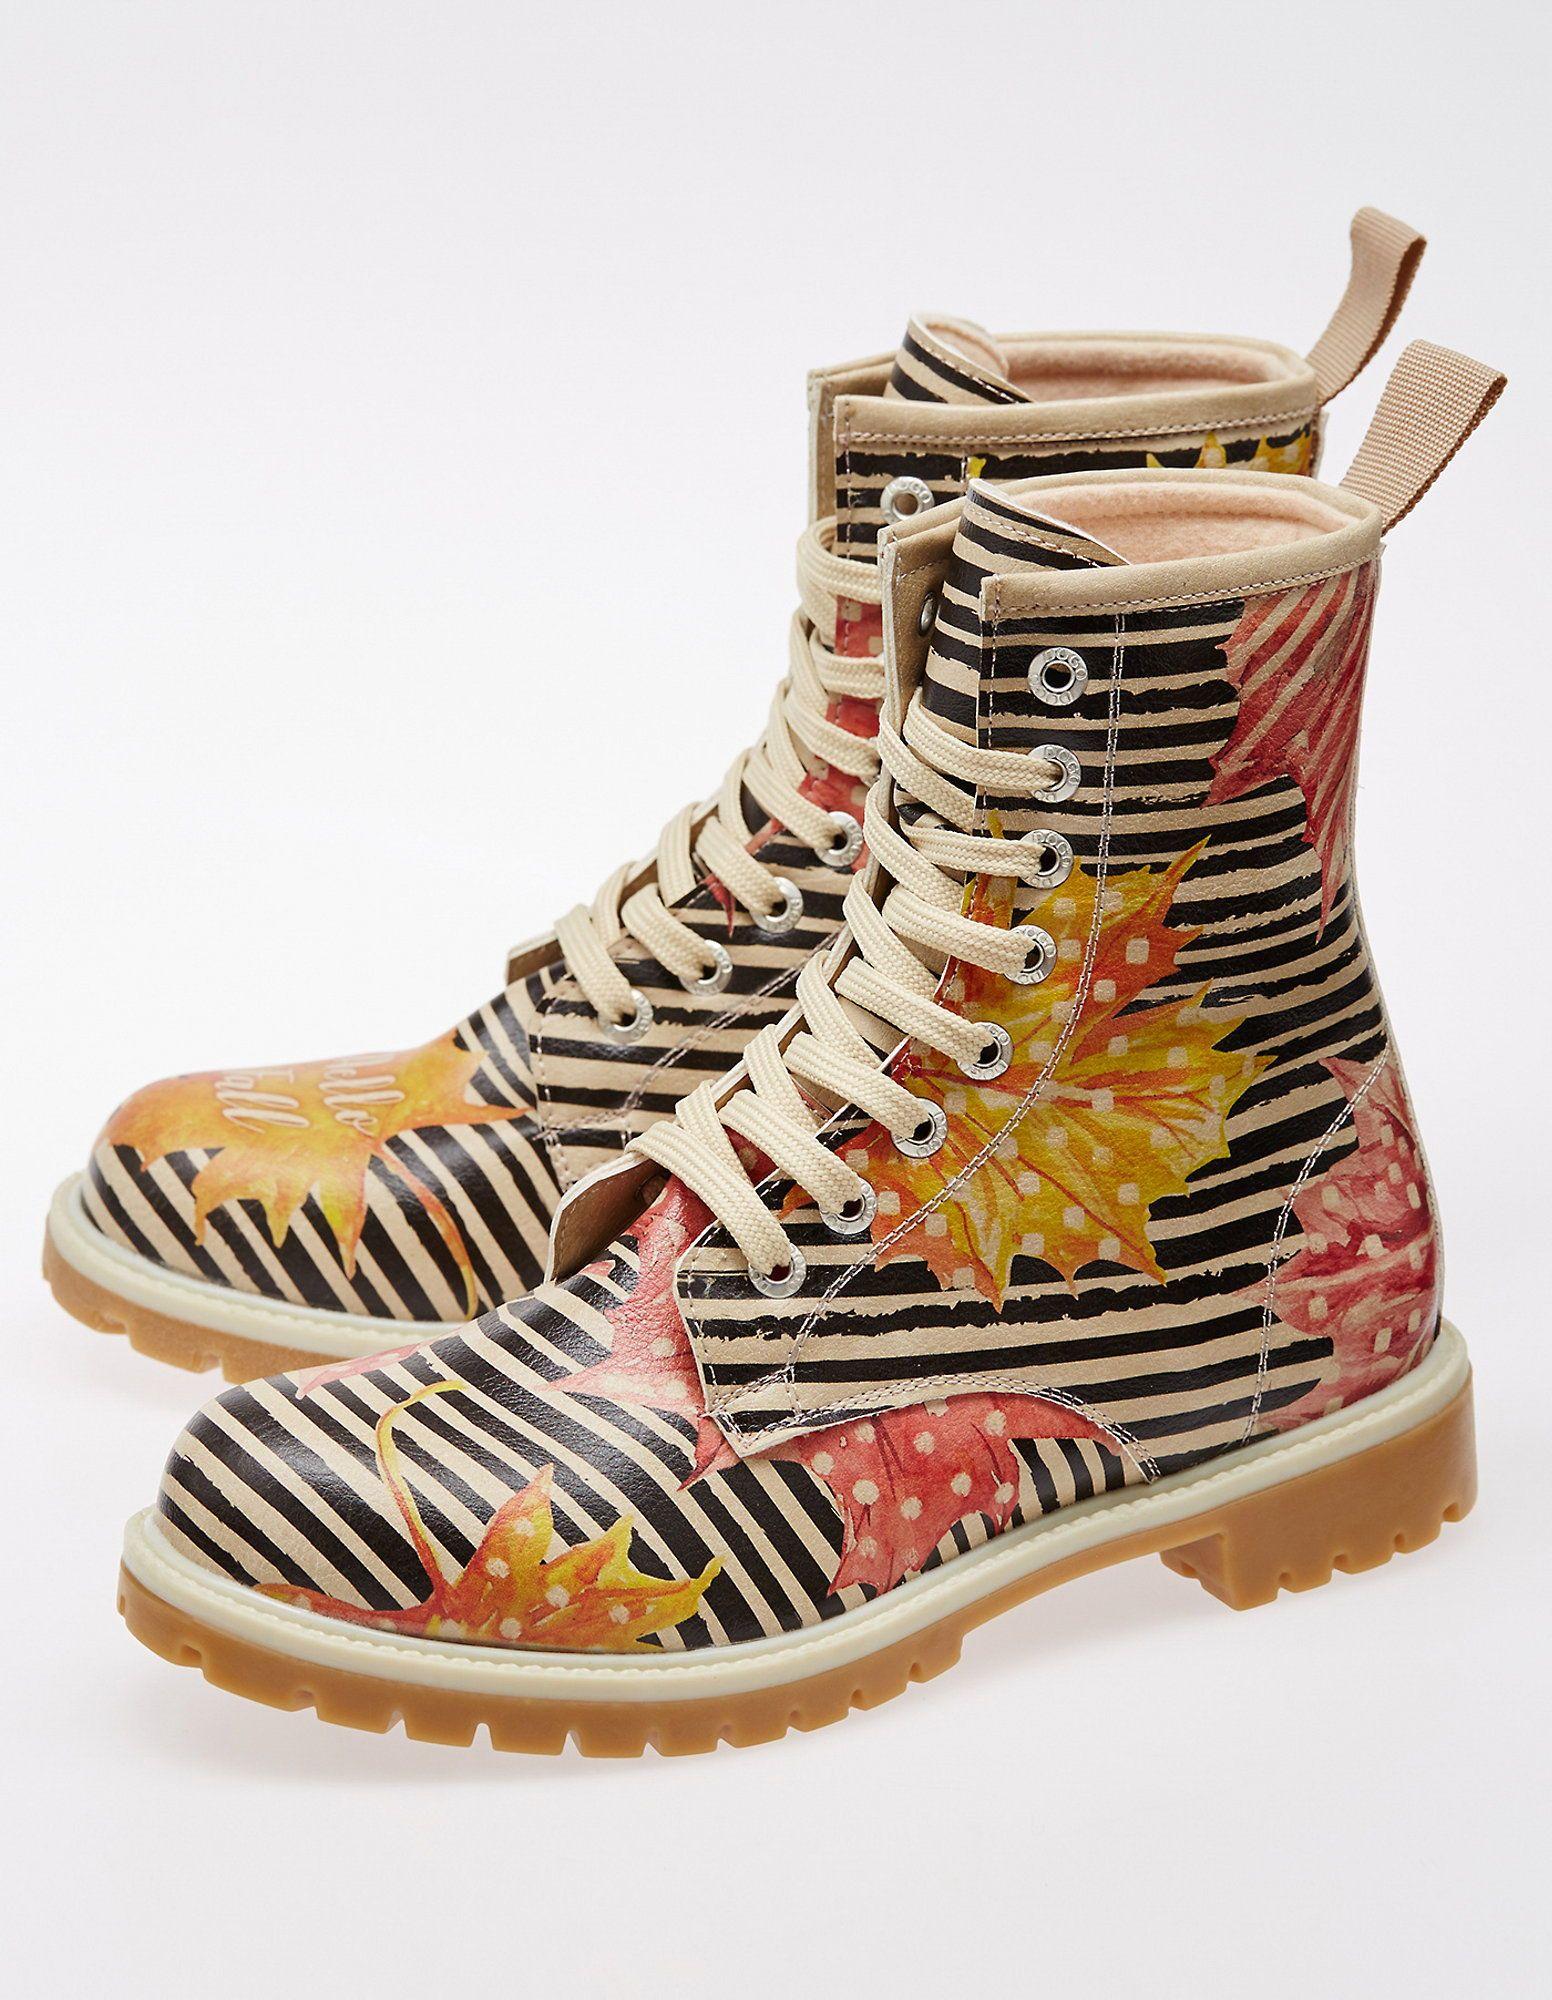 Schöner Hello Dogo Fall Shoes Stiefeletten Können Bunte CxBdoeQWrE